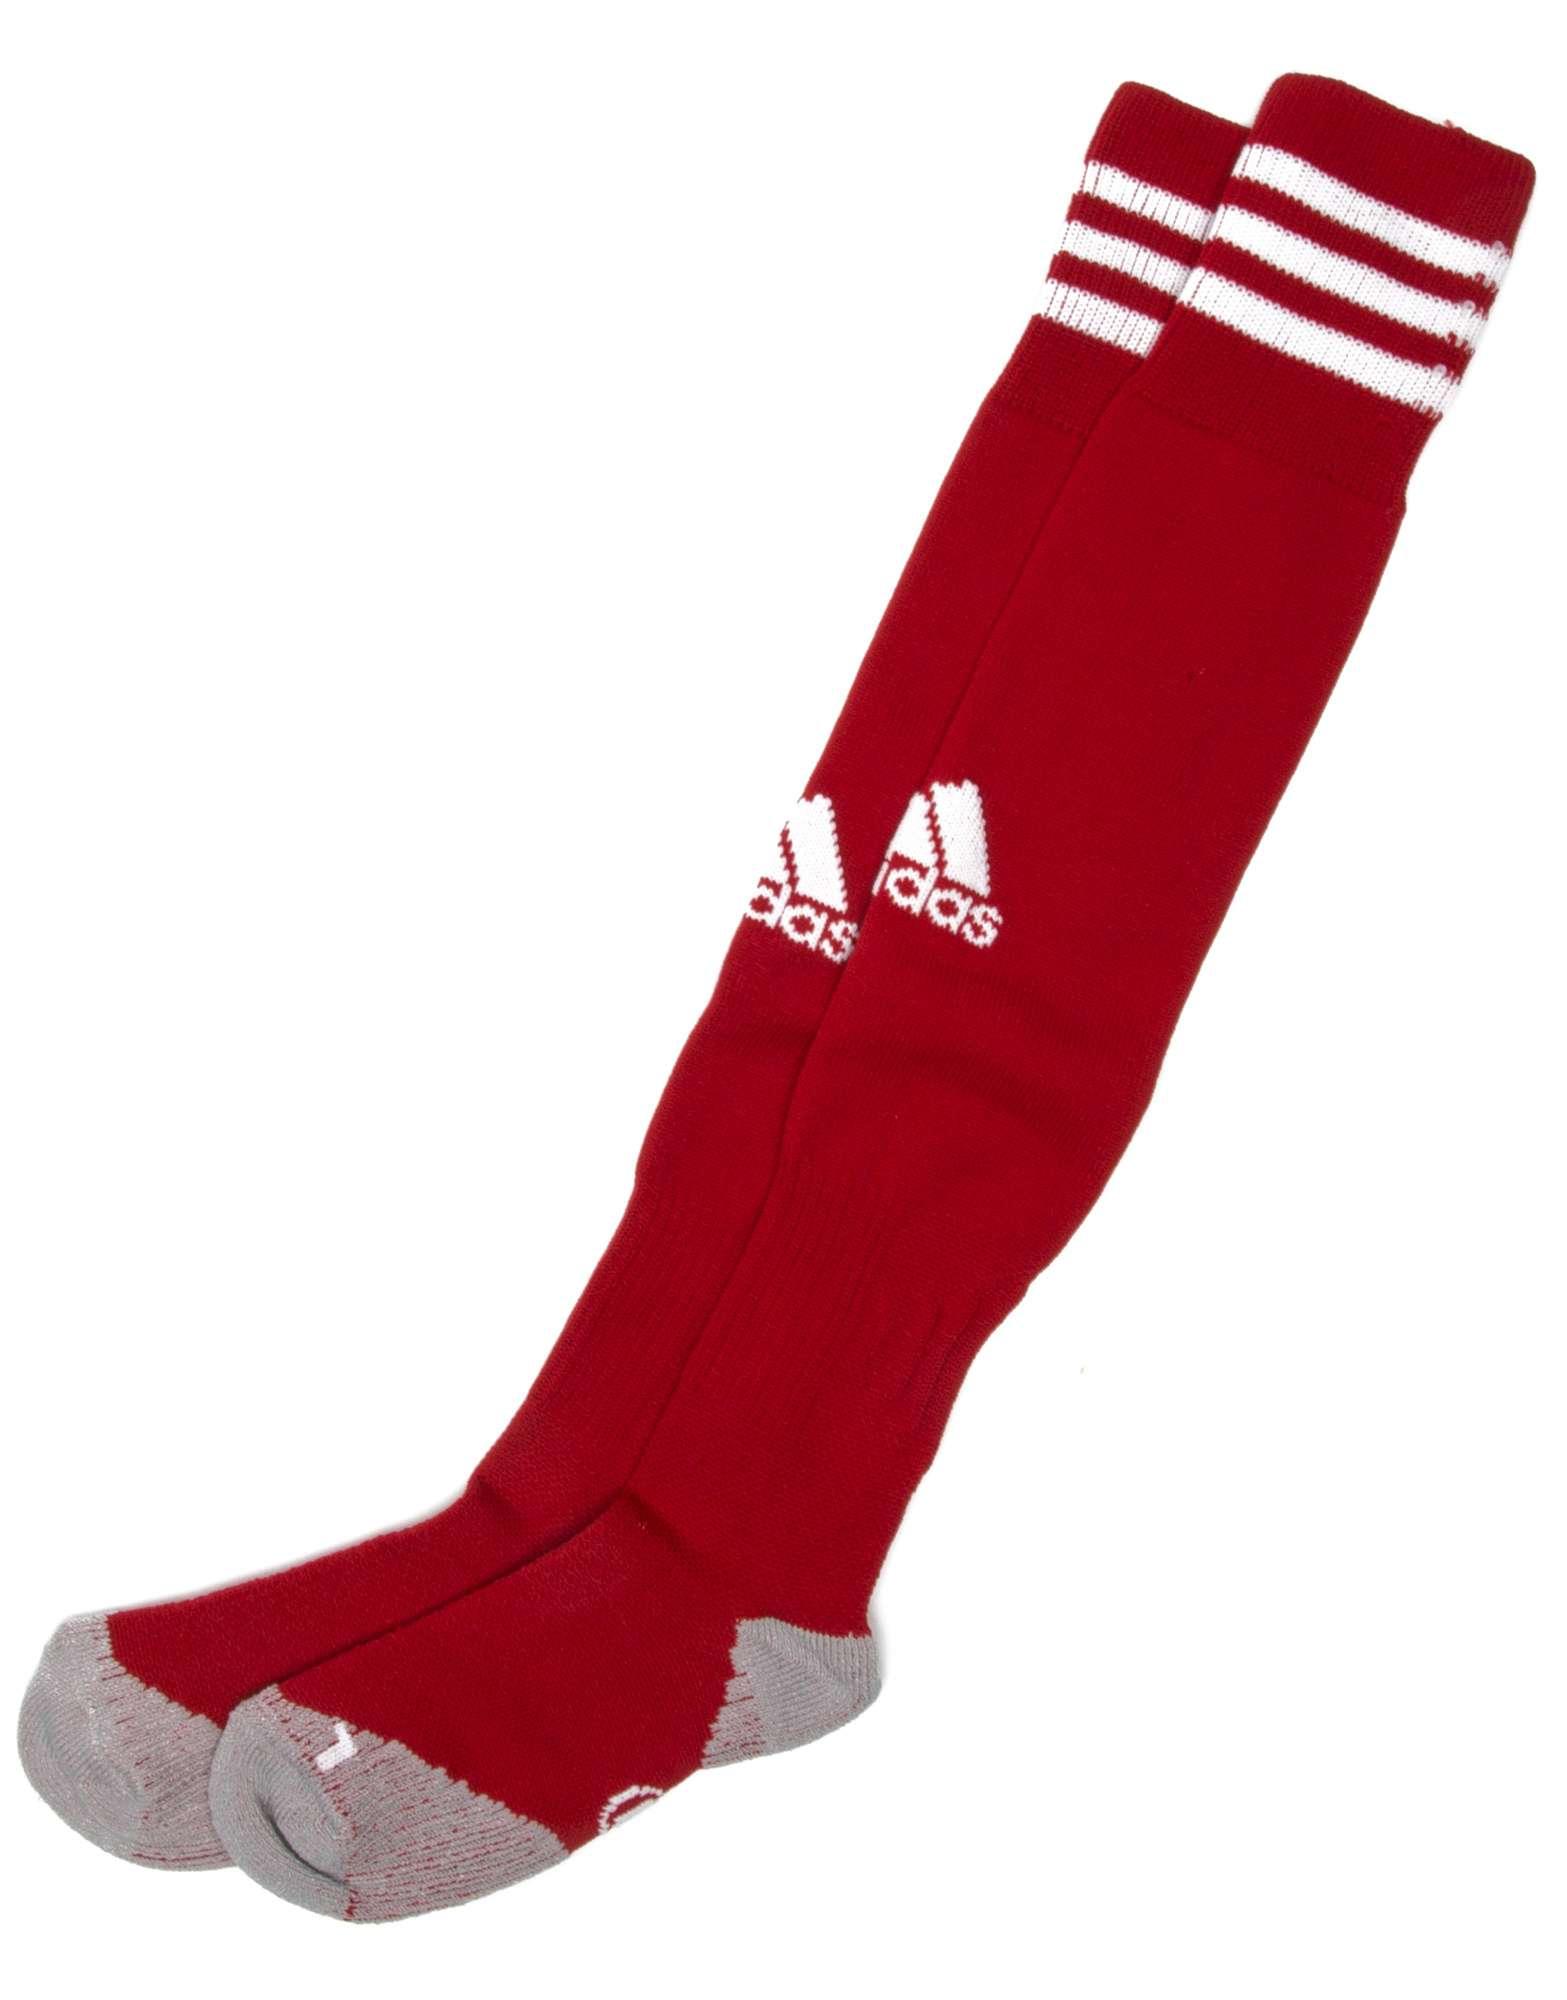 adidas Wales 2014 Junior Home Socks